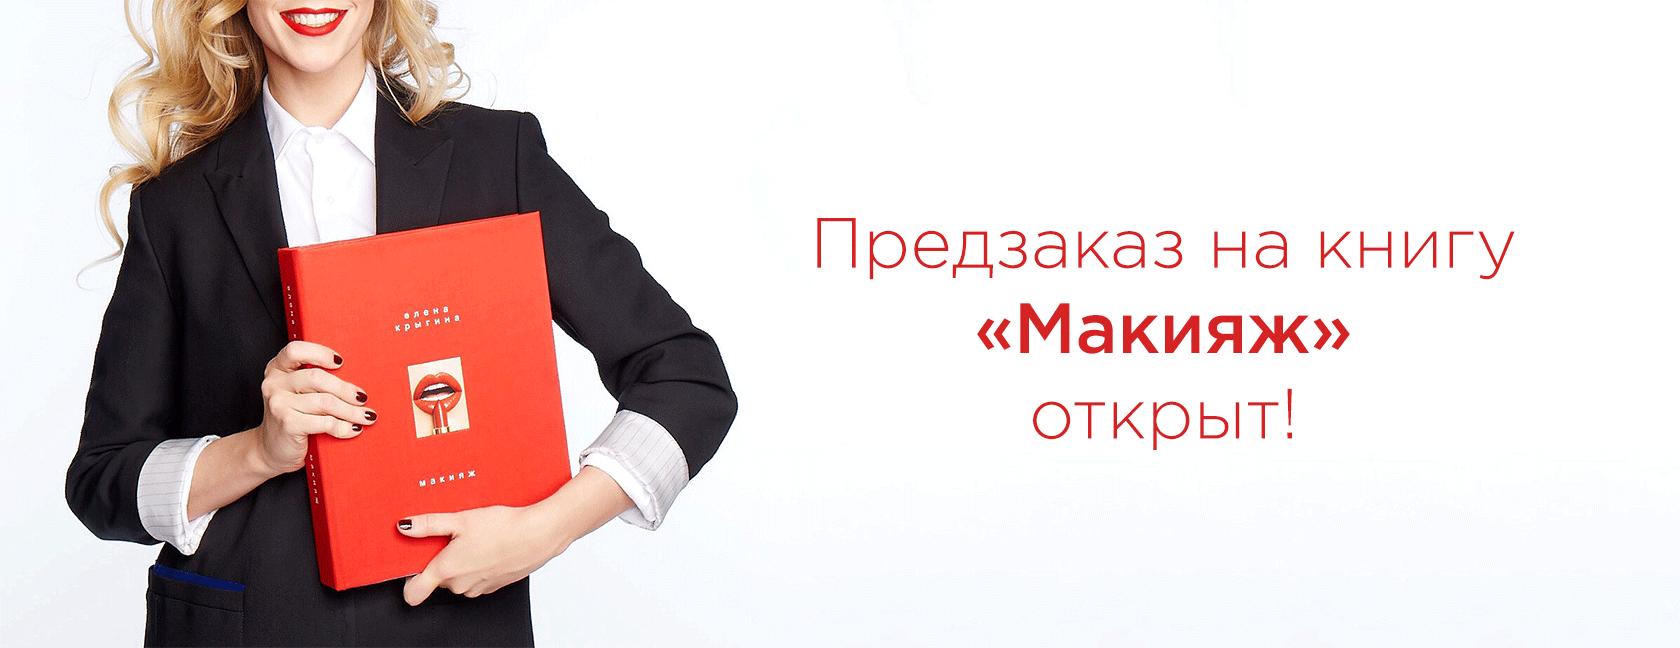 книга Макияж Елена Крыгина